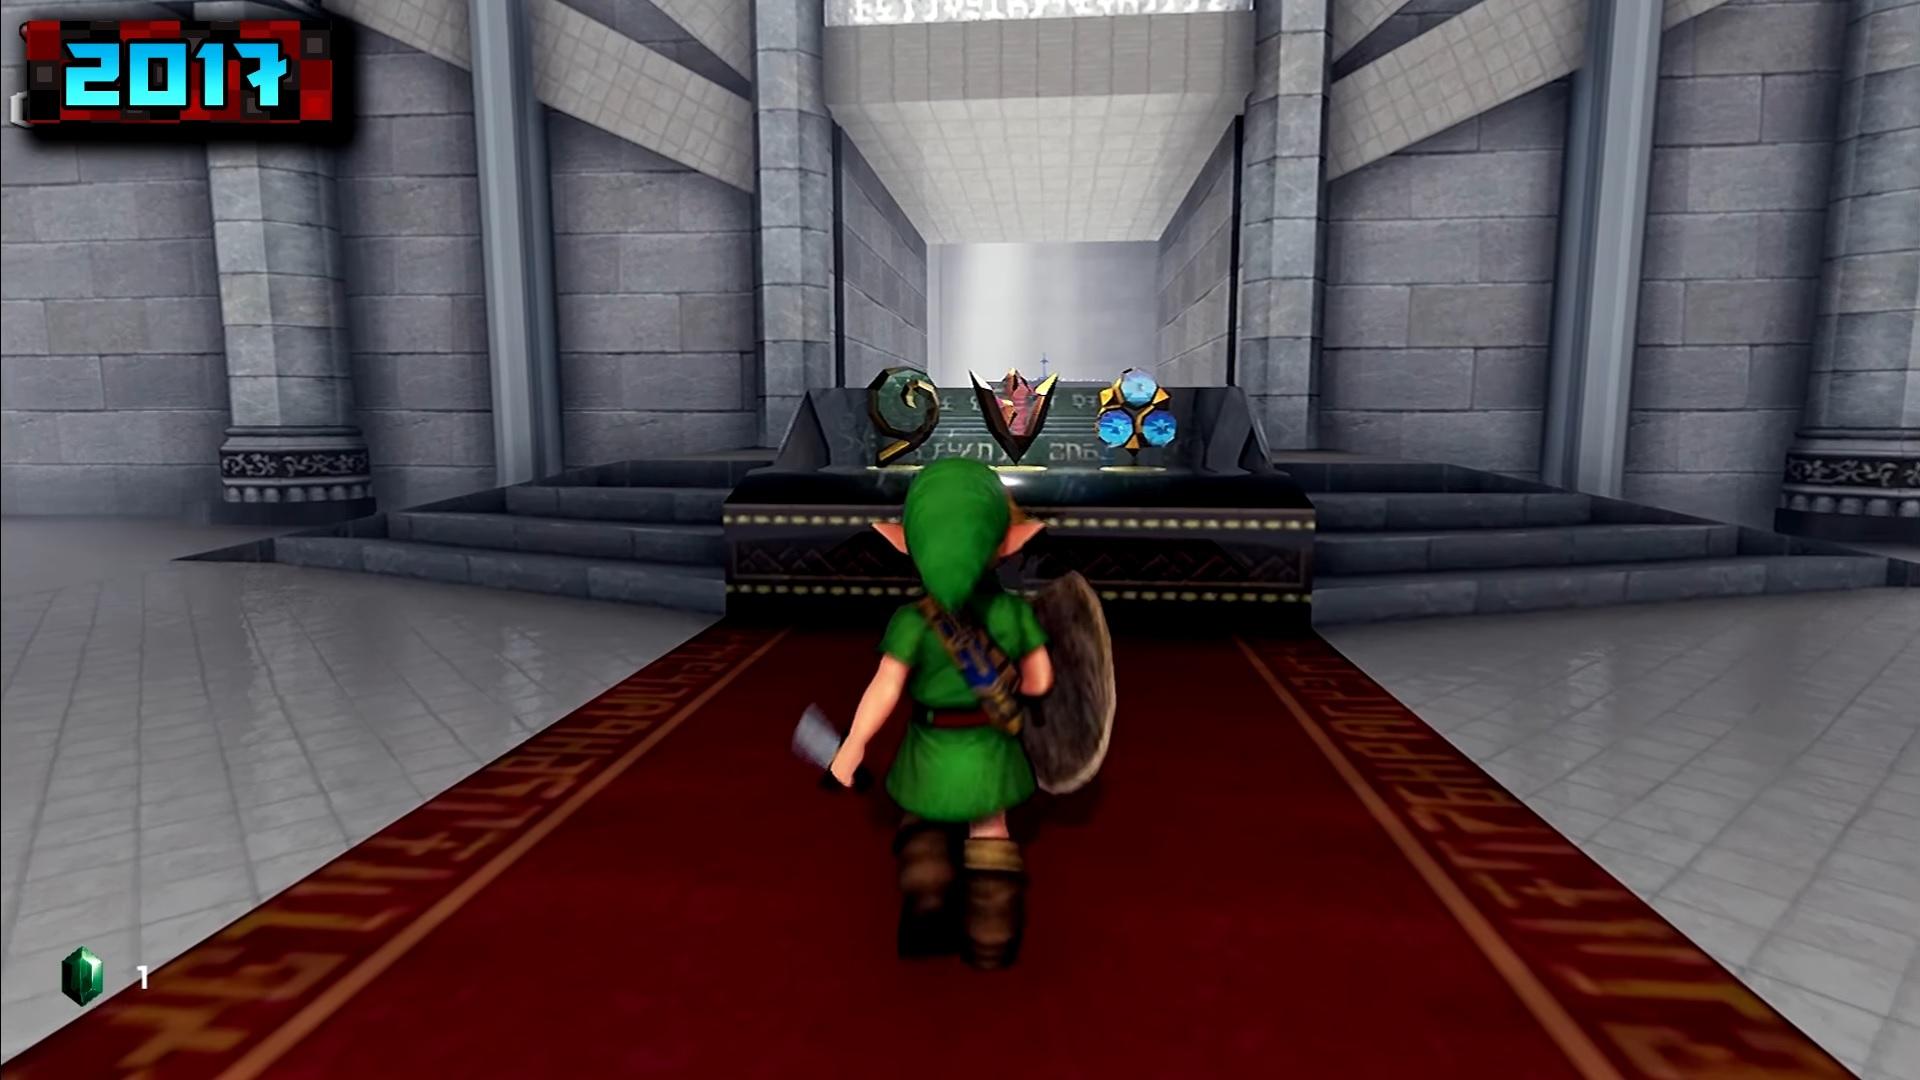 The Legend of Zelda: Ocarina of Time comparison - Original